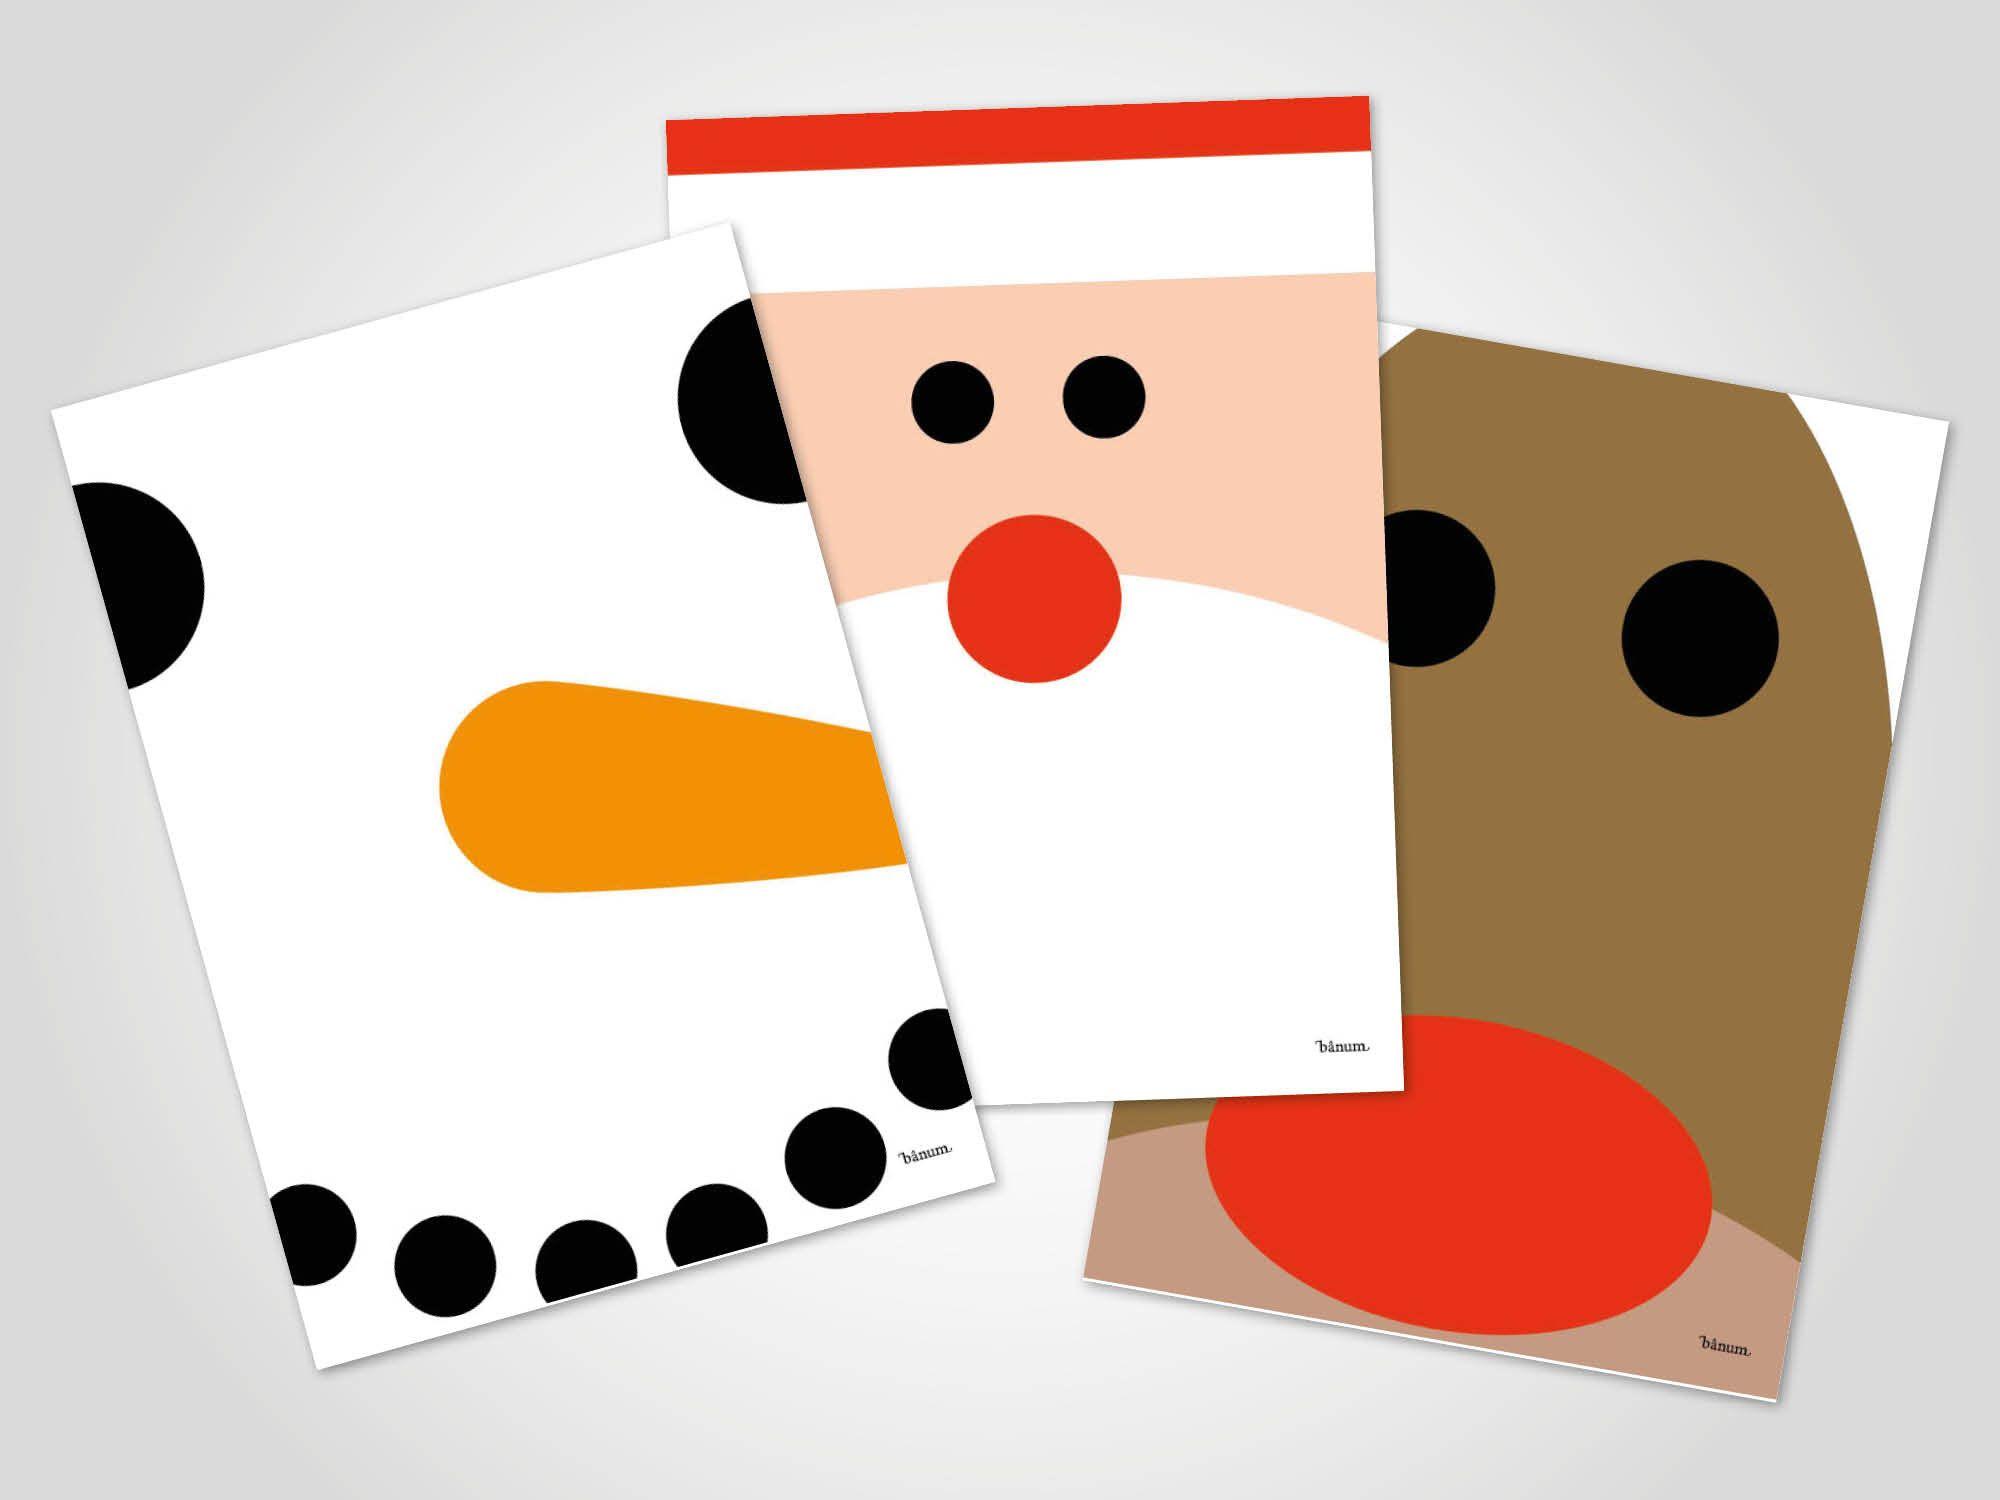 Christmas Set / Weihnachtskarte, Grußkarte, Karte bei Nikolaus Grußkarte